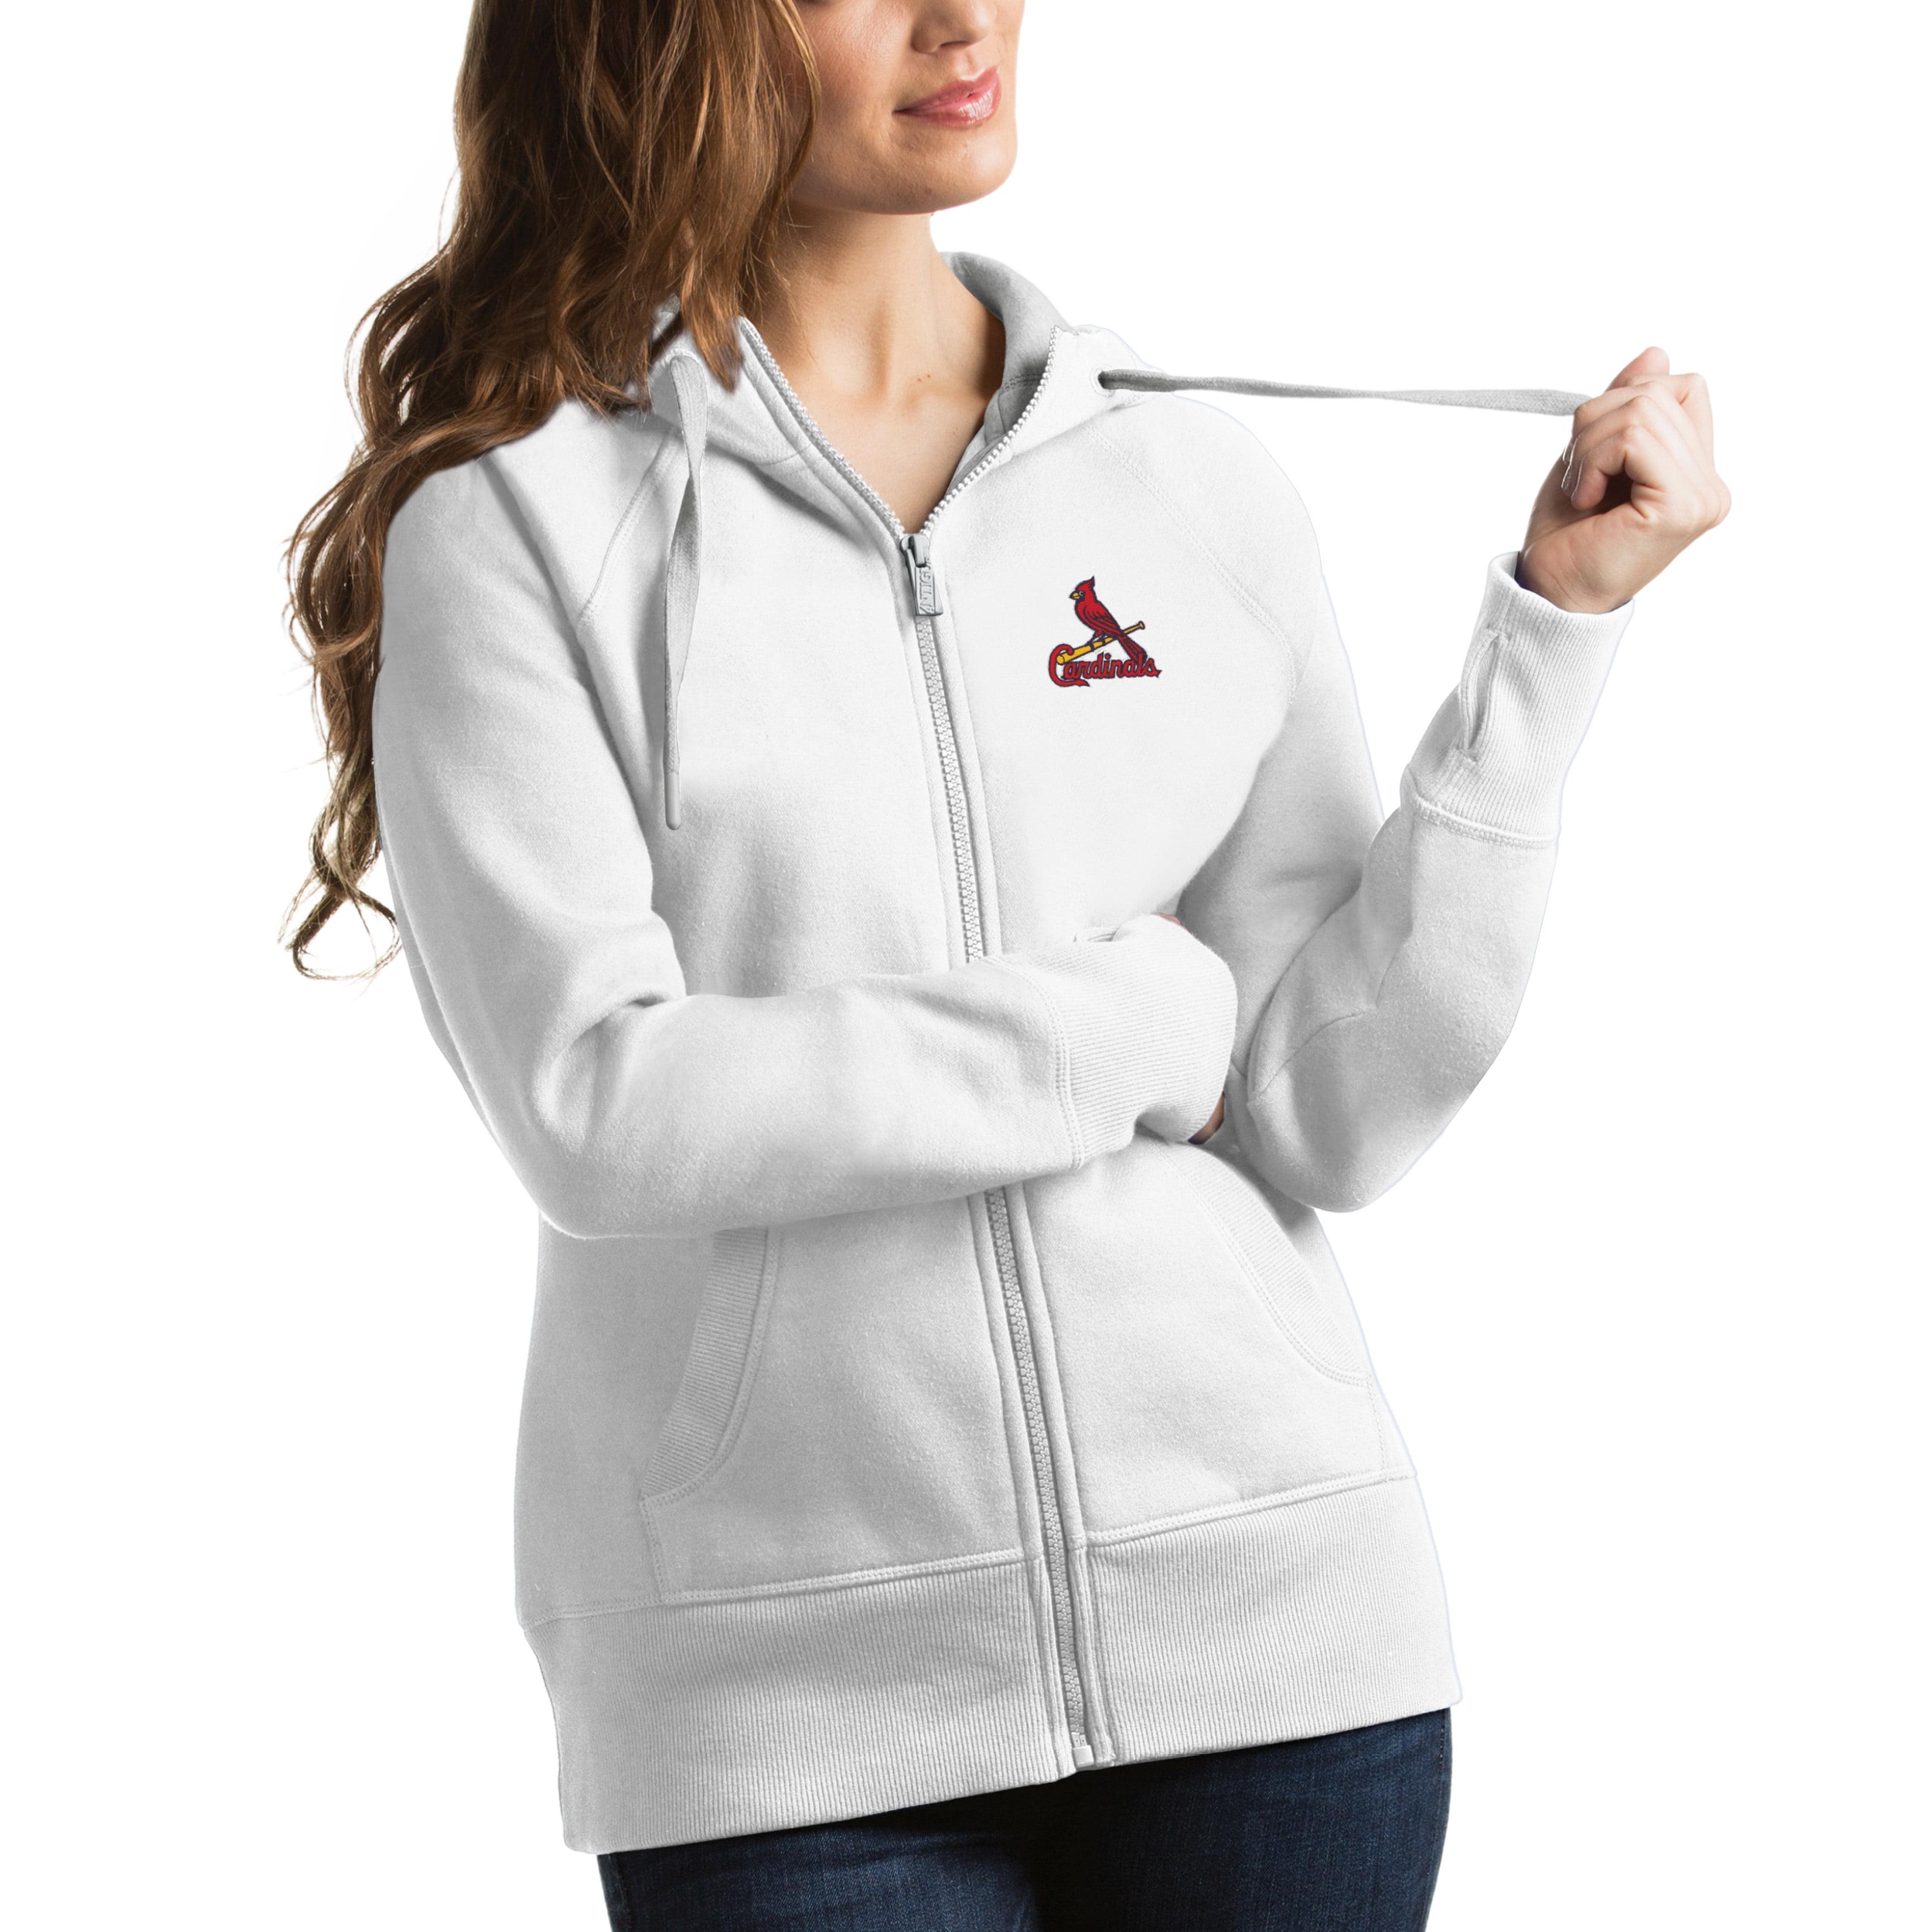 St. Louis Cardinals Antigua Women's Victory Full-Zip Hoodie - White